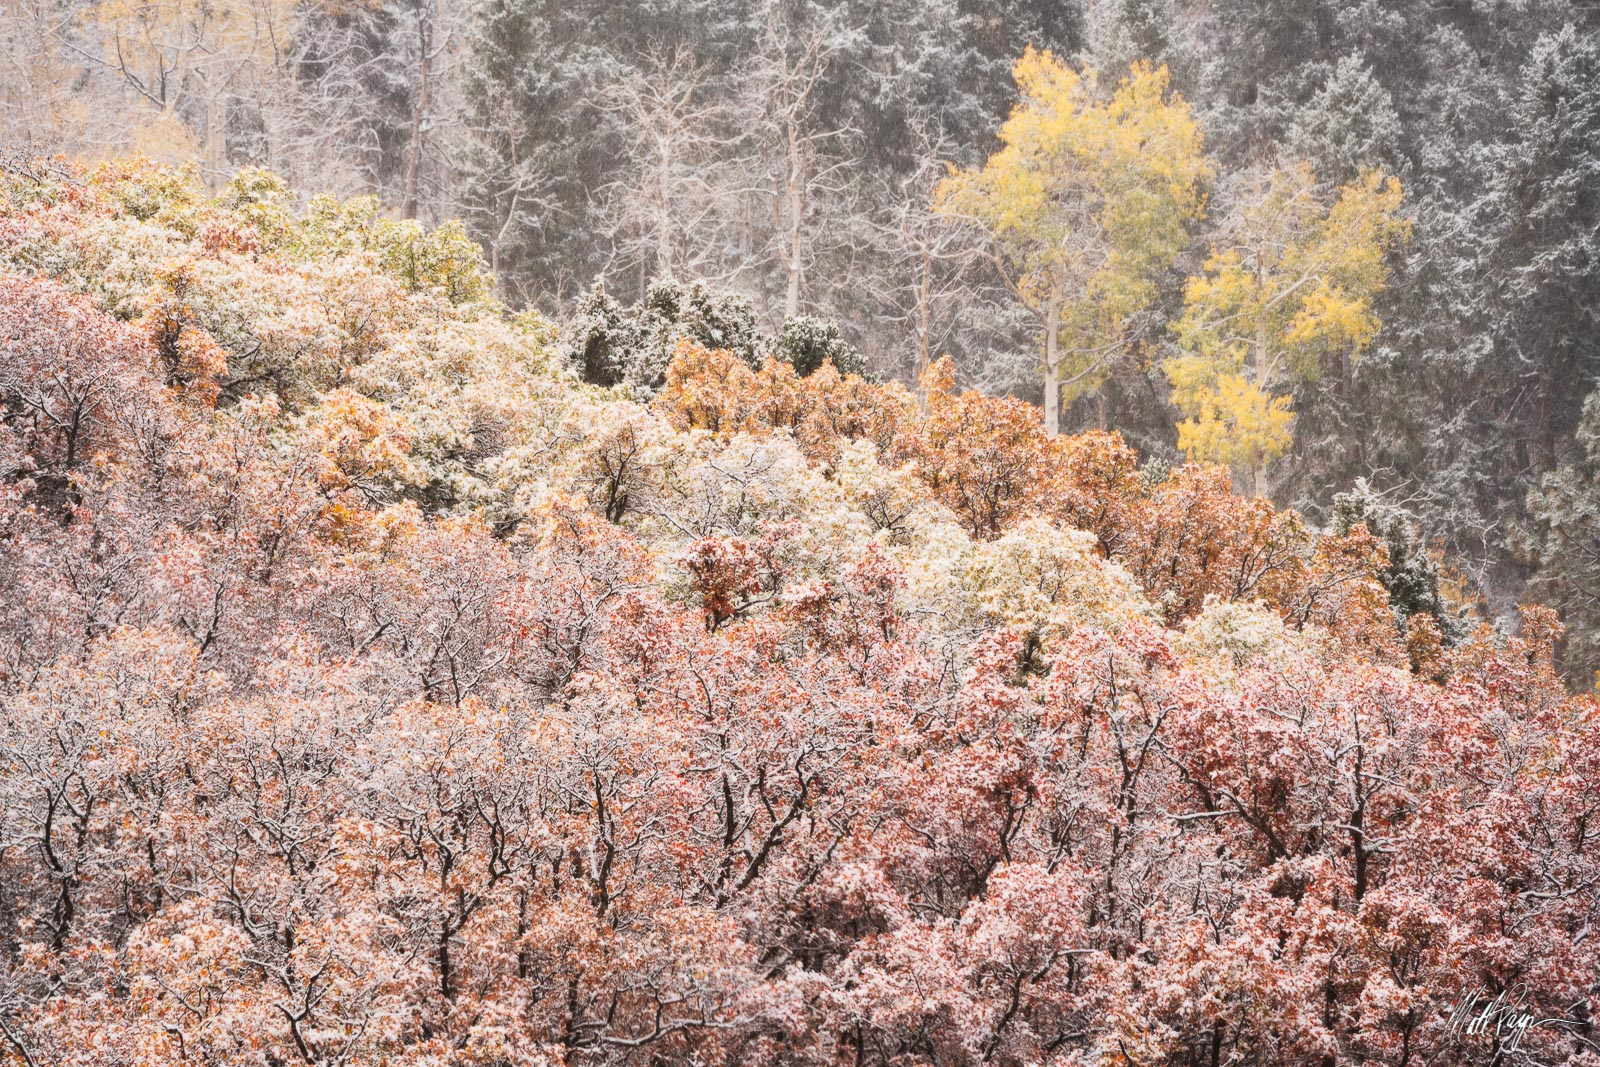 Scrub Oak and Aspen Trees adorned with snow on a foggy autumn morning near Ridgway, Colorado.Photo © copyright by Matt Payne...